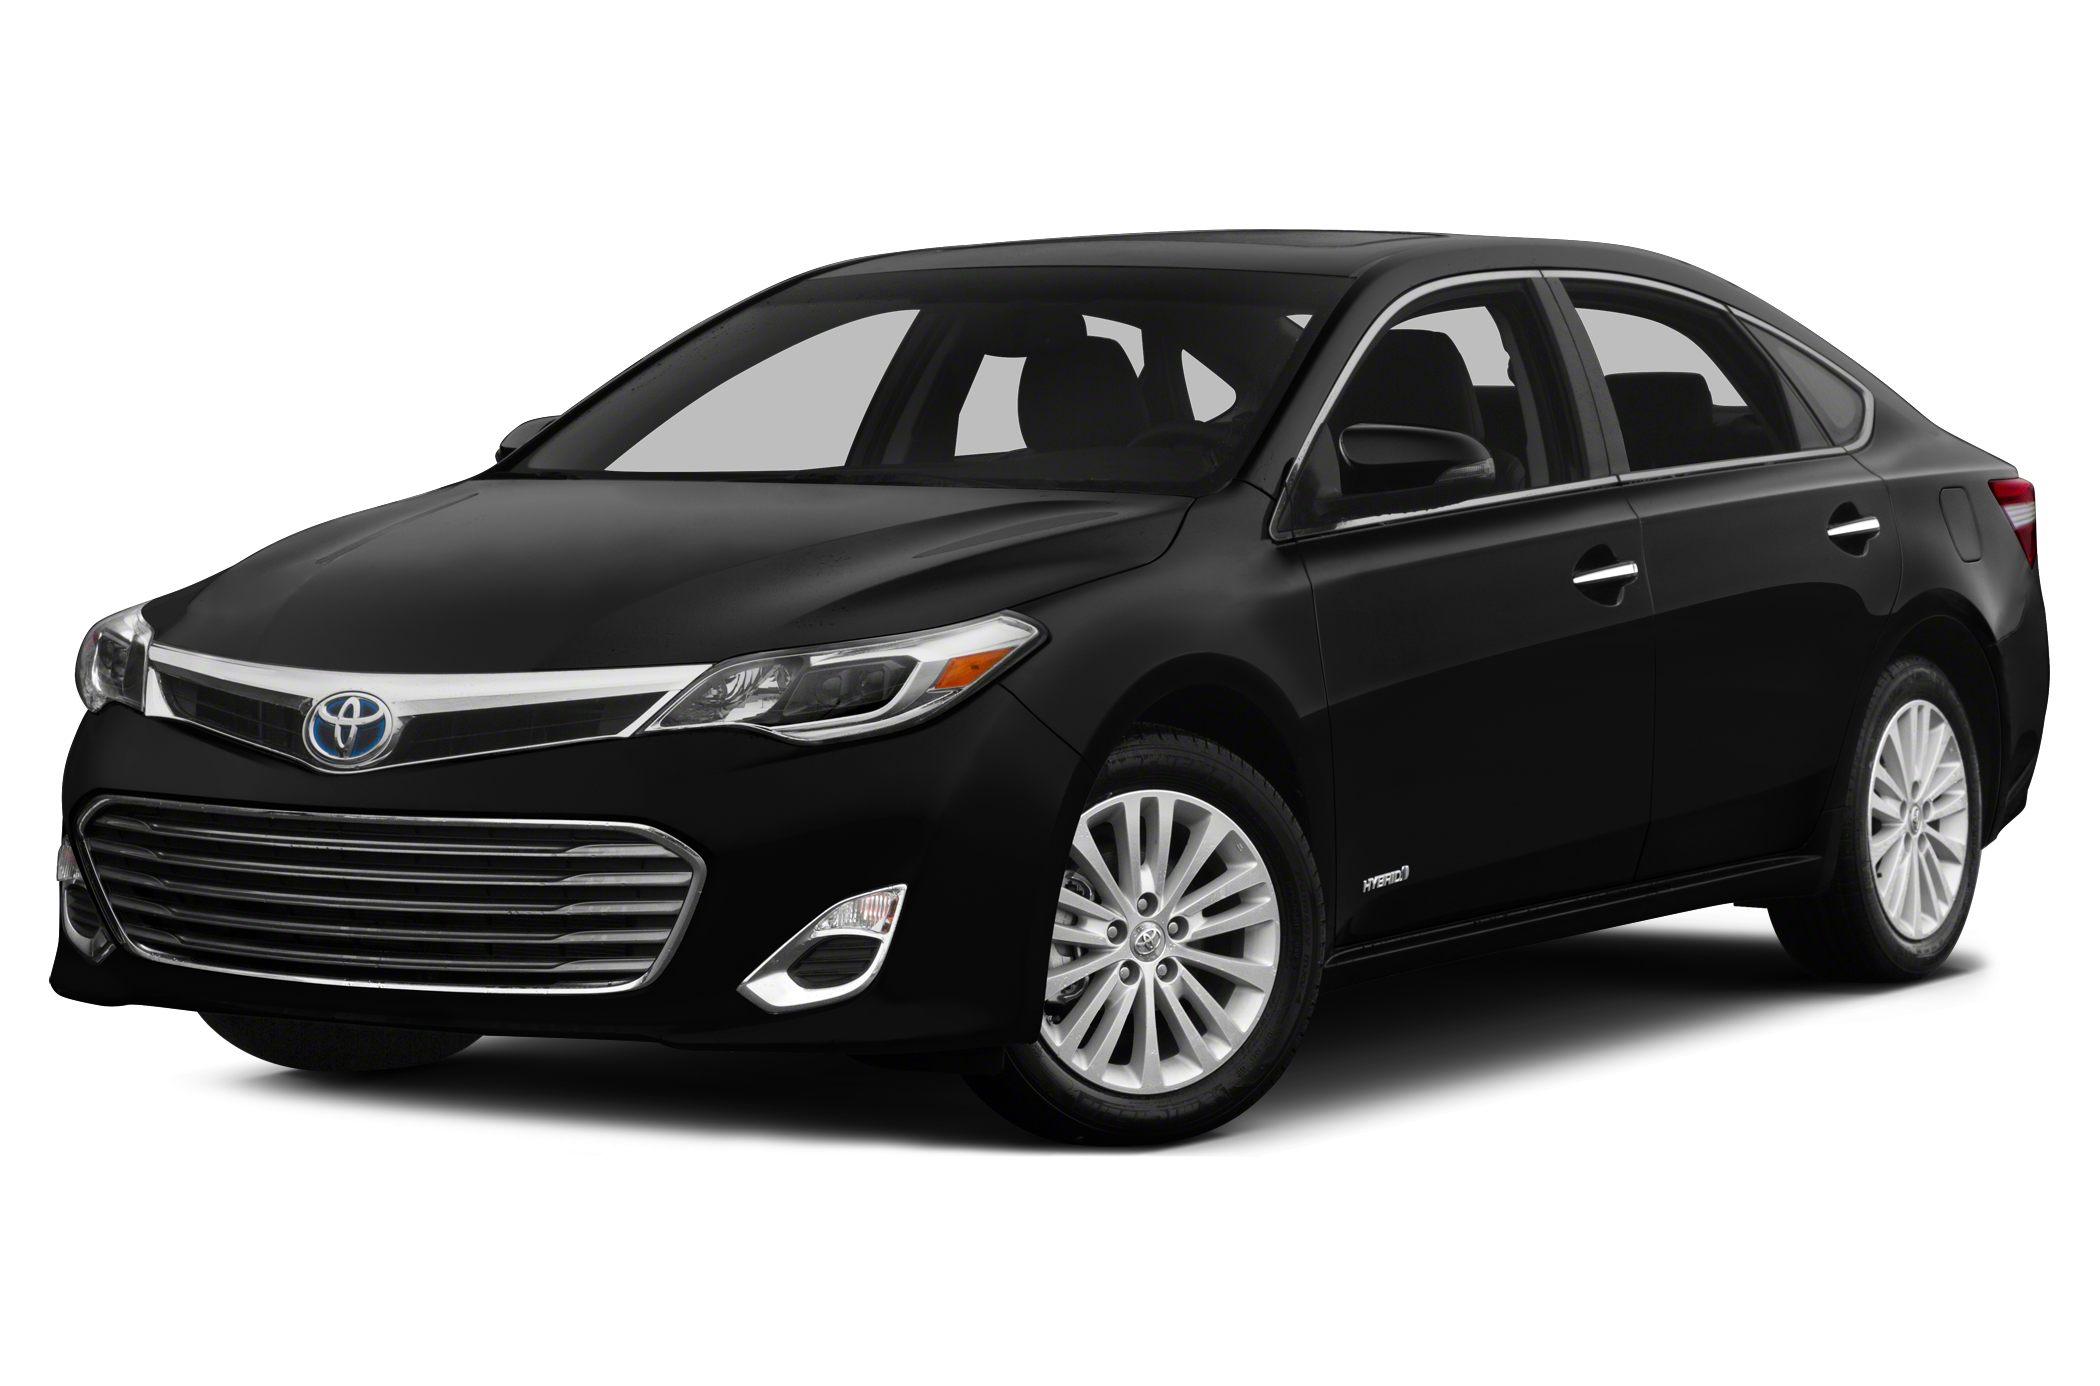 2014 Toyota Avalon Hybrid New Car Test Drive